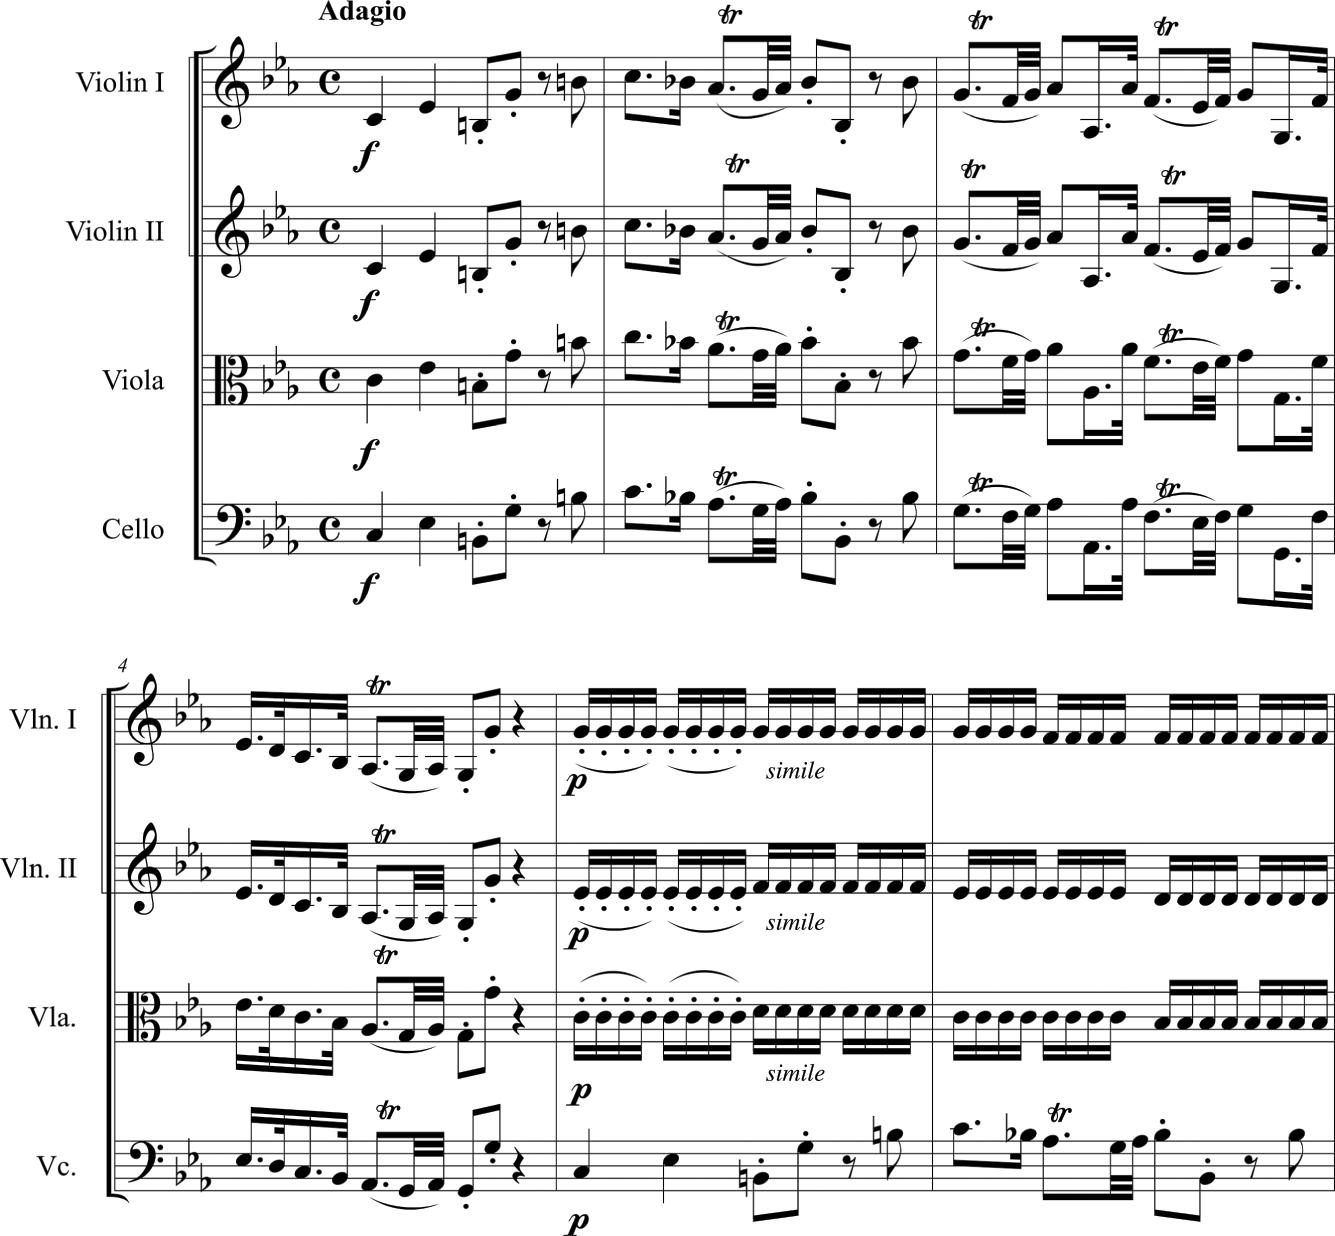 Six Duets Volume 2 8 Barthelemon Duets 3 /& 4 for Violin /& Viola  op